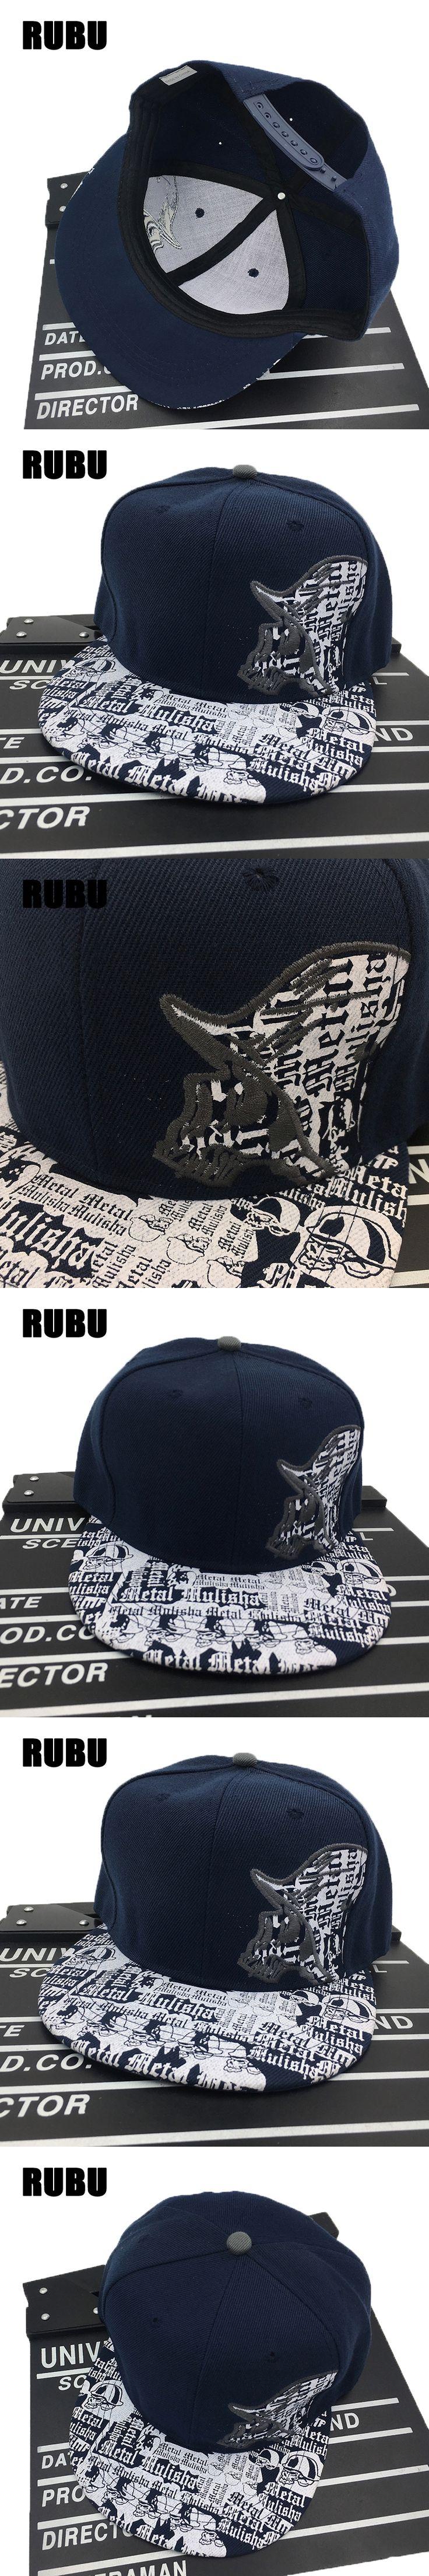 K pop Hip hop Caps Men Casual Bone Baseball Caps women Adjustable Snapback Sun hats for Men Brand baseball cap Gorras Bone